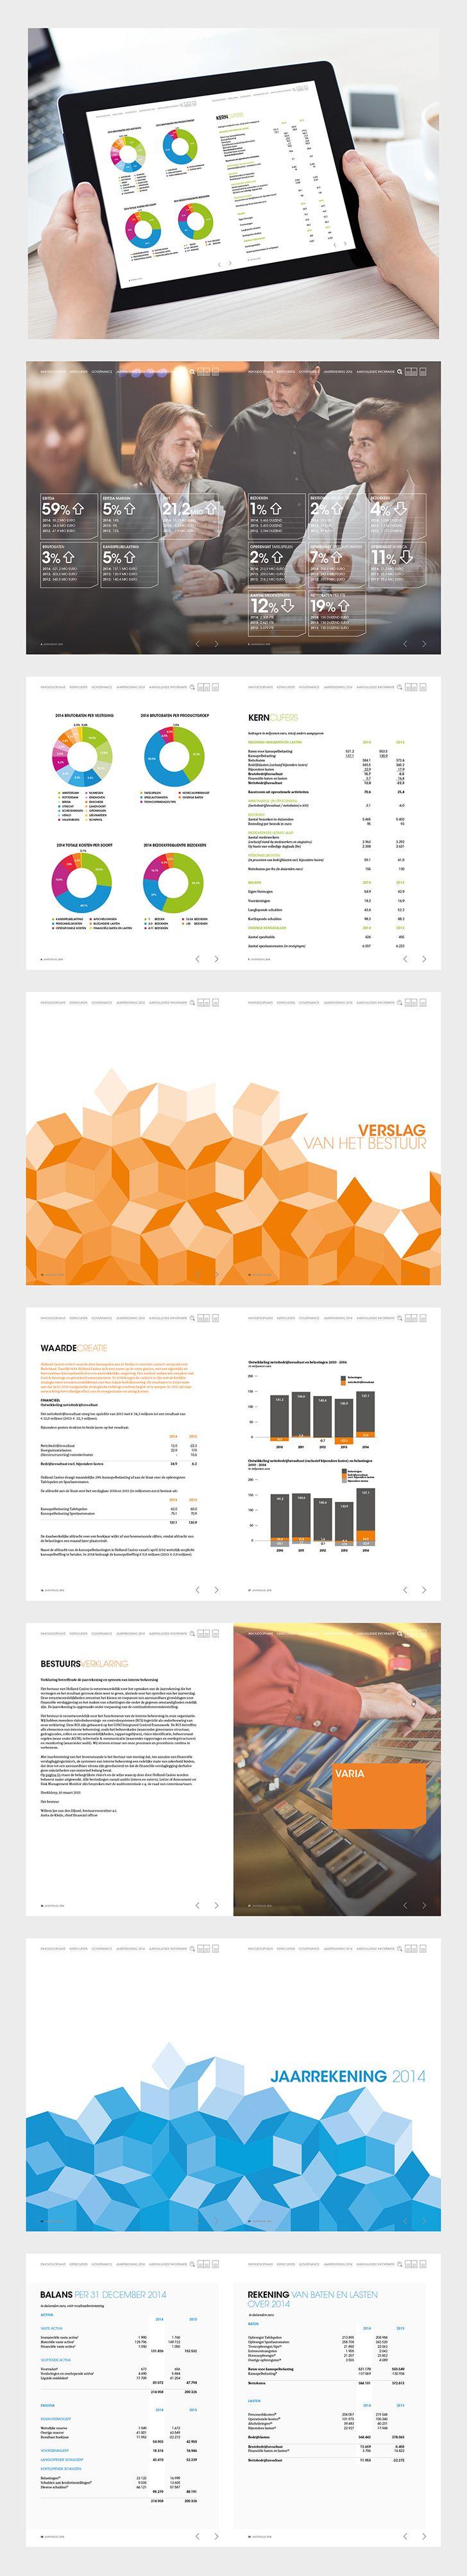 Corporate Design :: Holland Casino :: Jaarverslag.